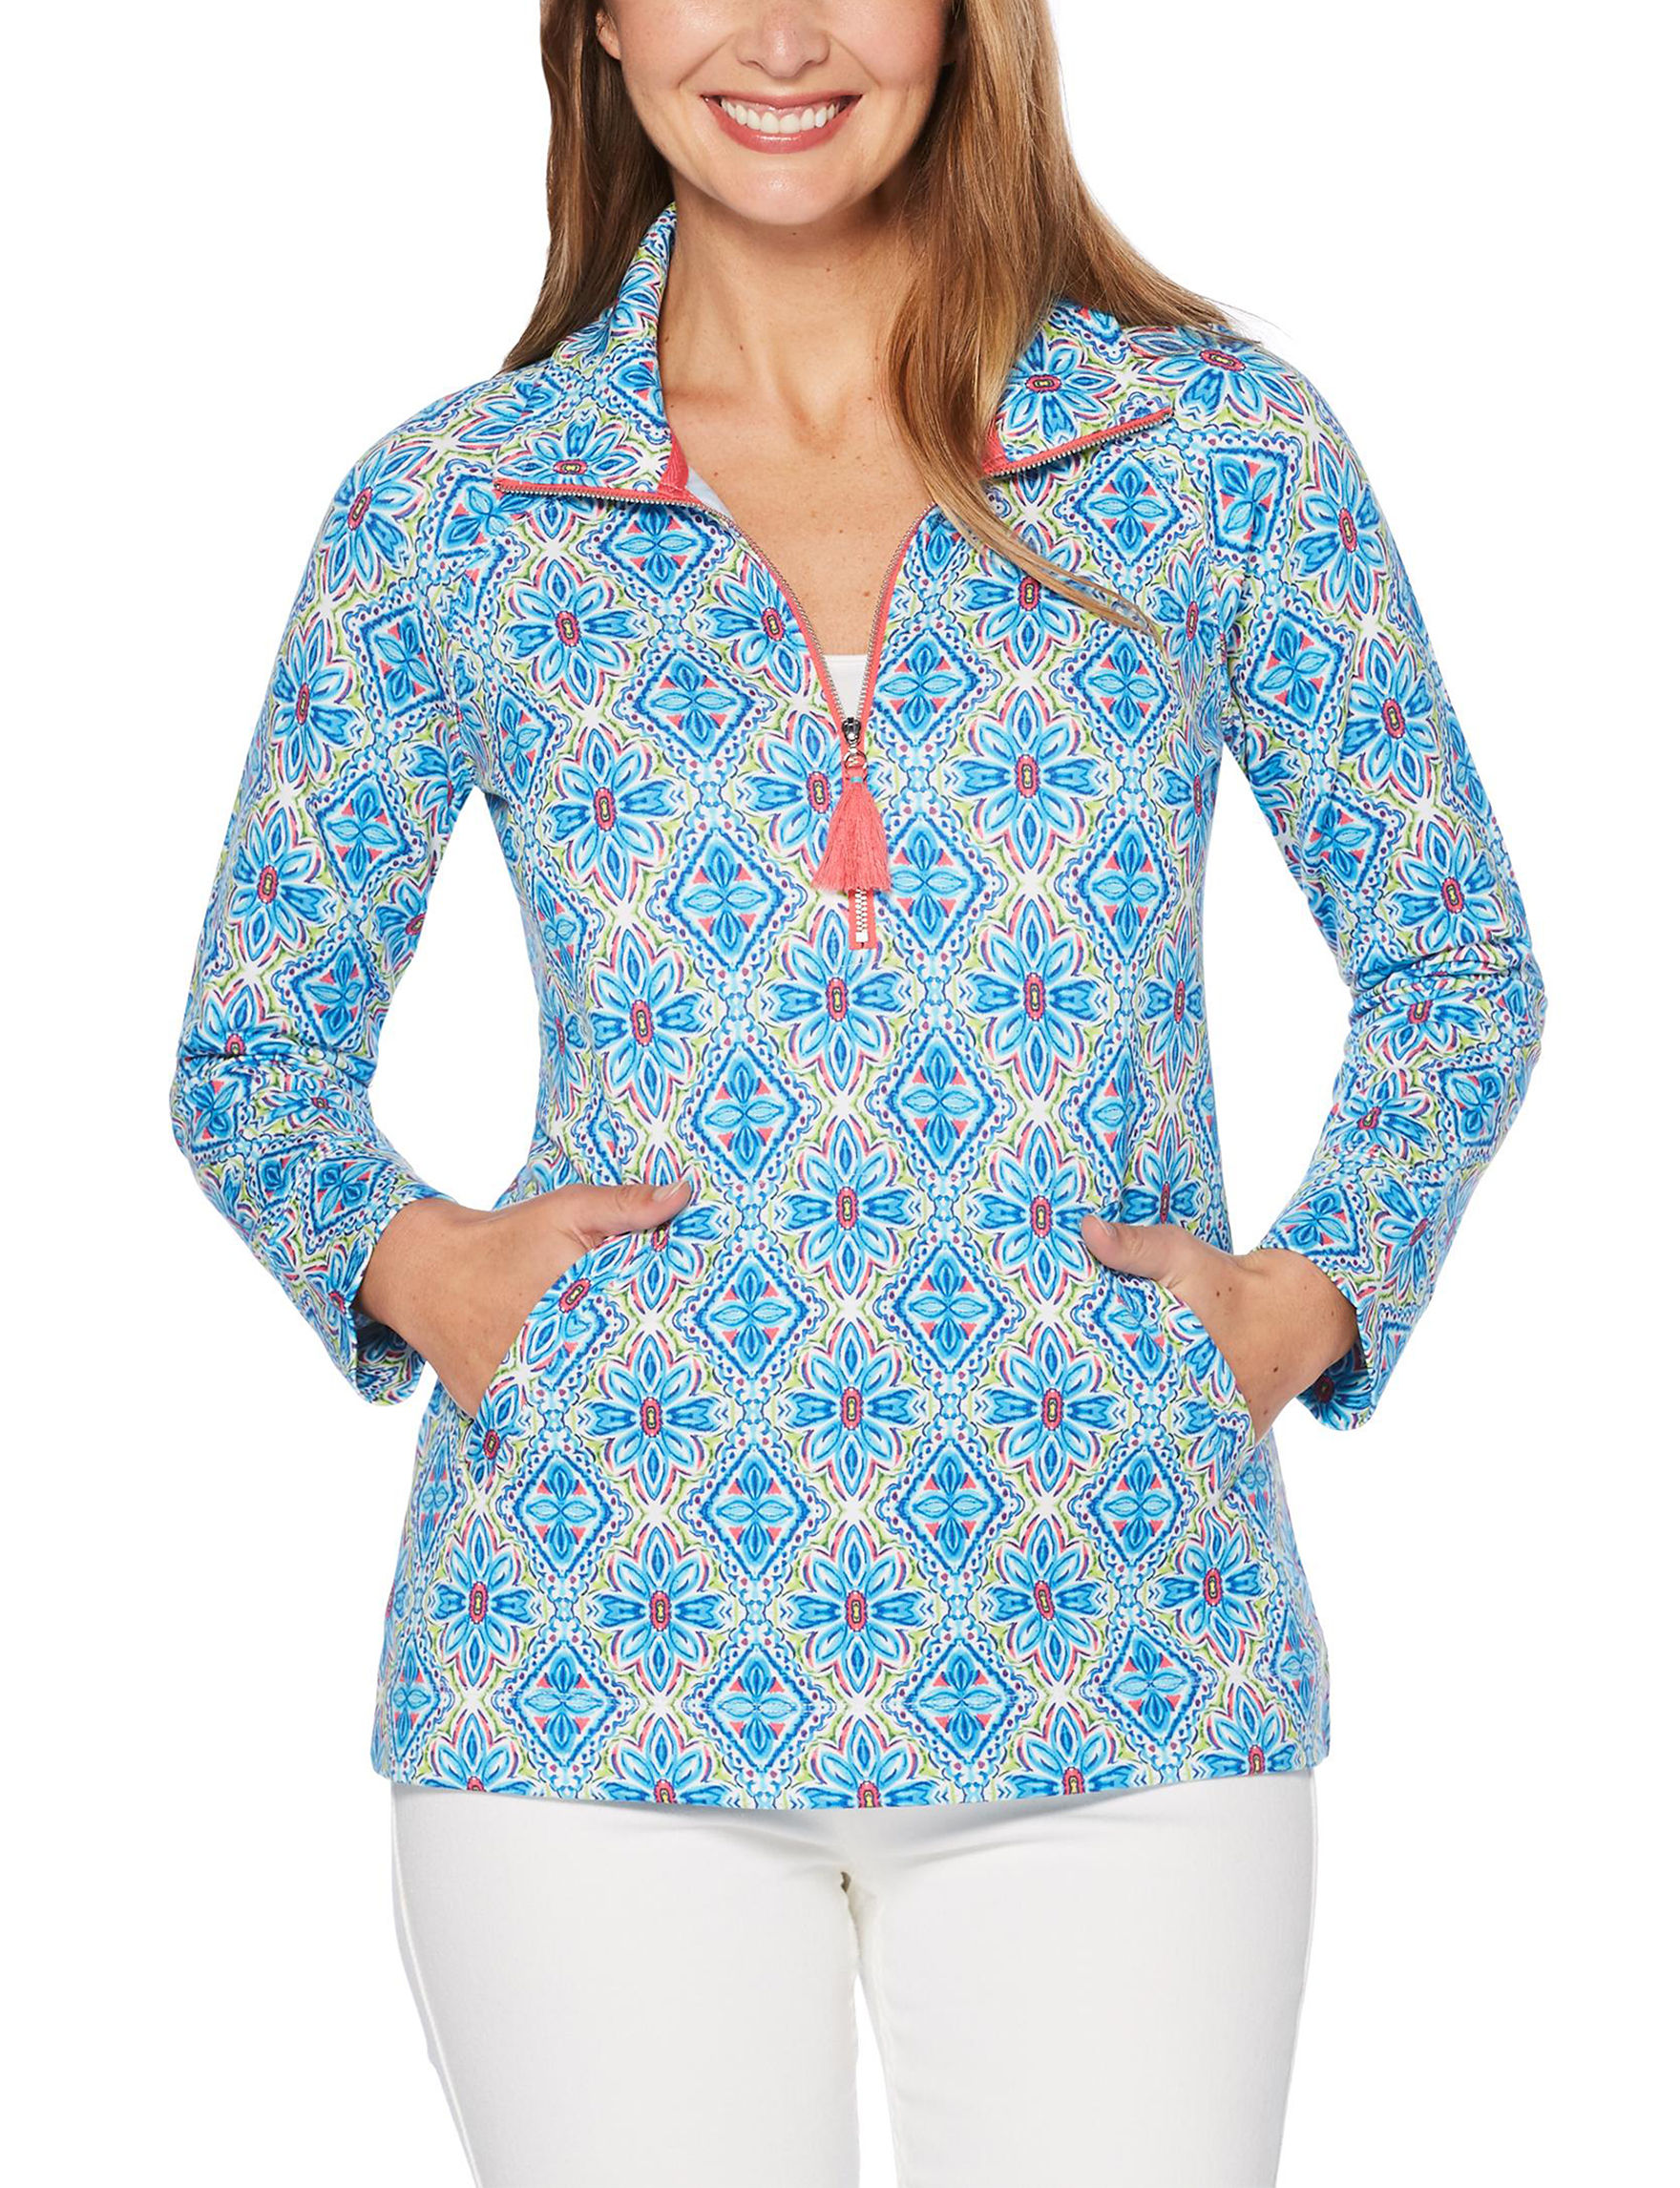 Rafaella Blue / Multi Pull-overs Shirts & Blouses